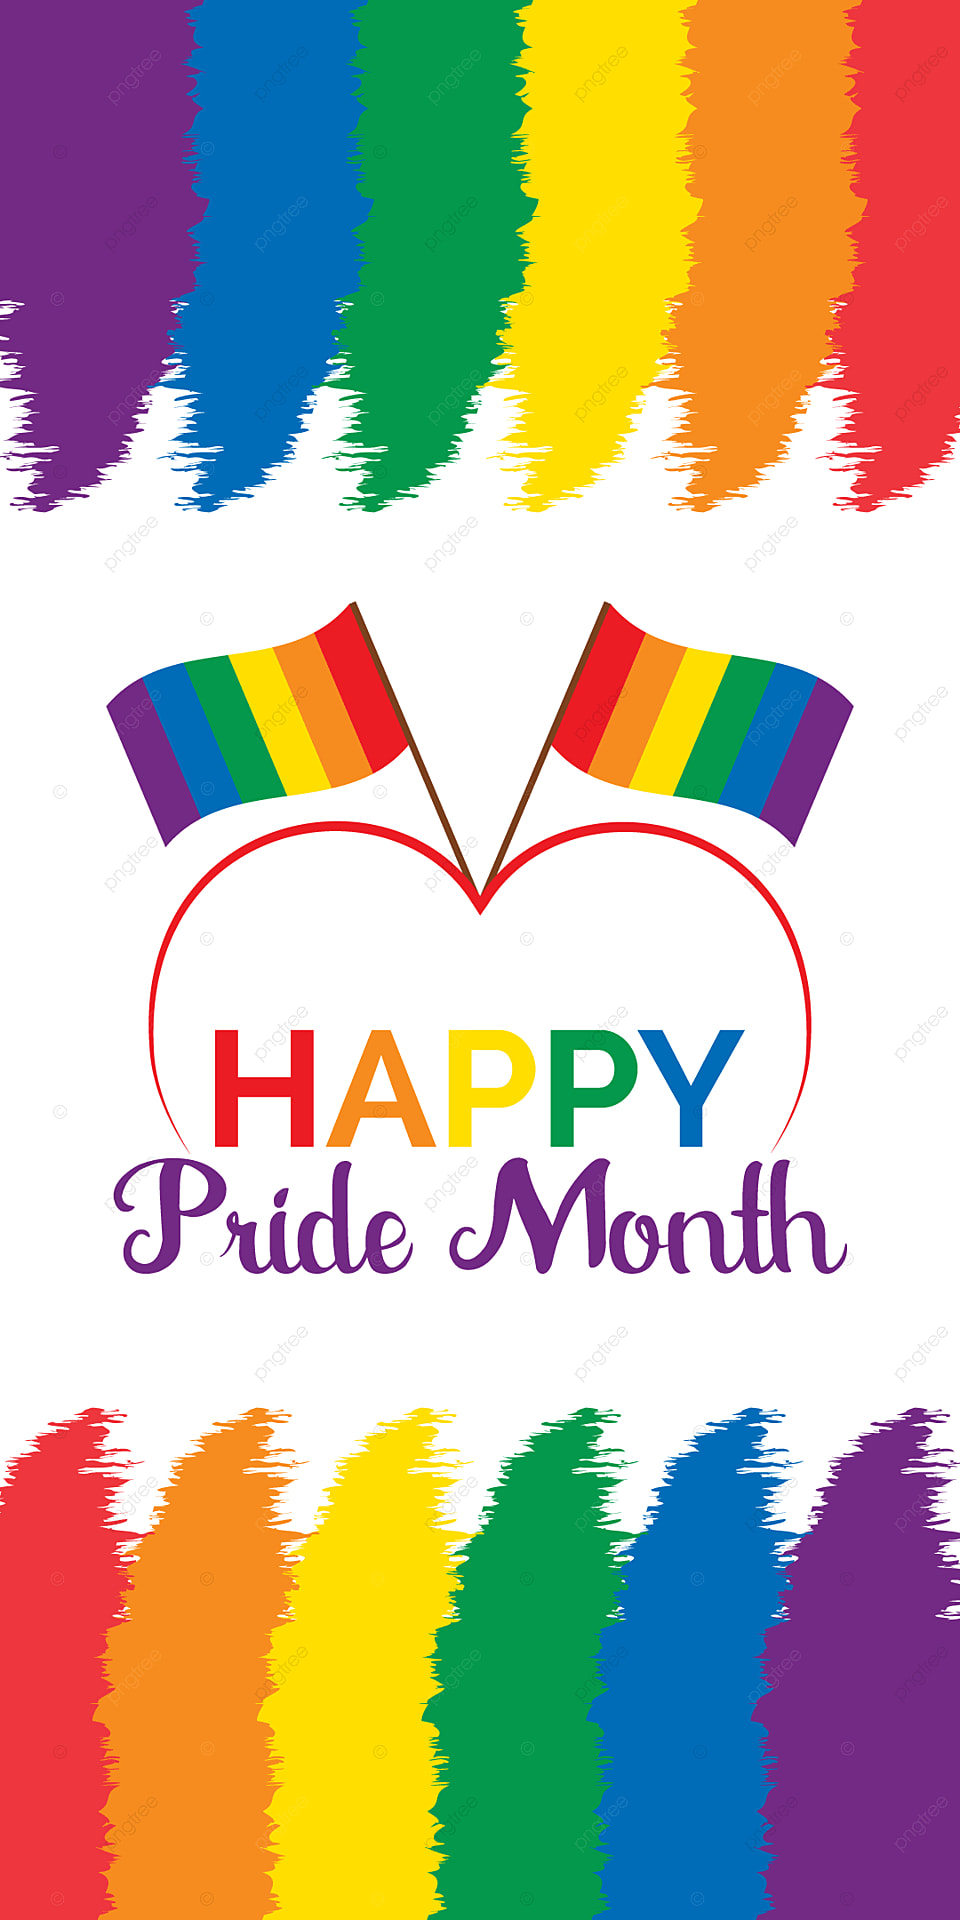 Happy Pride Month Mobile Wallpaper Background Vector Design 960x1920